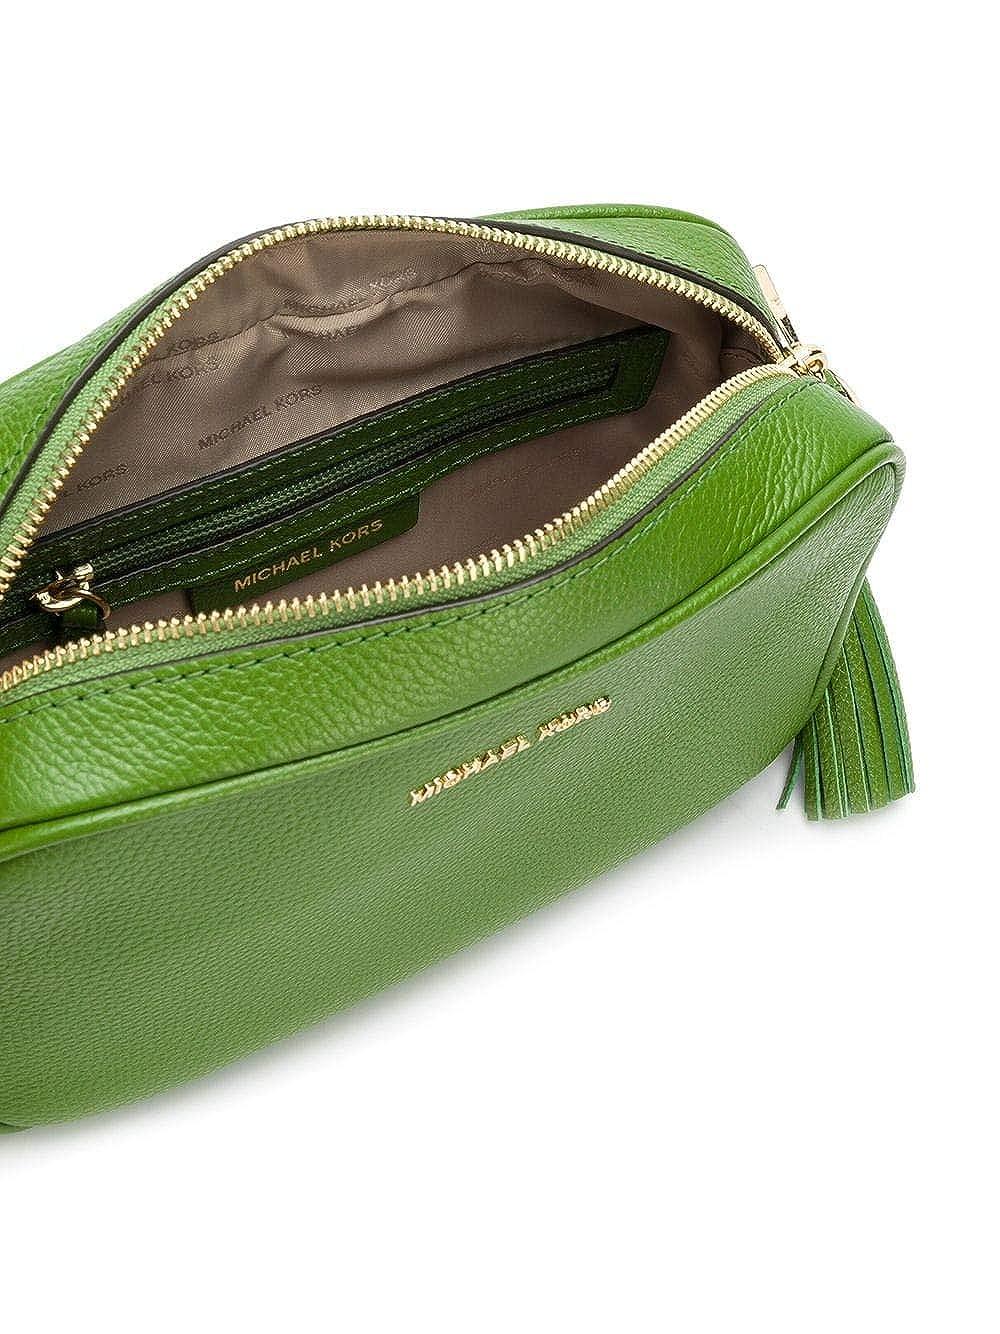 6fb84a12989612 Michael Kors Ginny Medium Leather Camera Crossbody Bag - True Green:  Handbags: Amazon.com